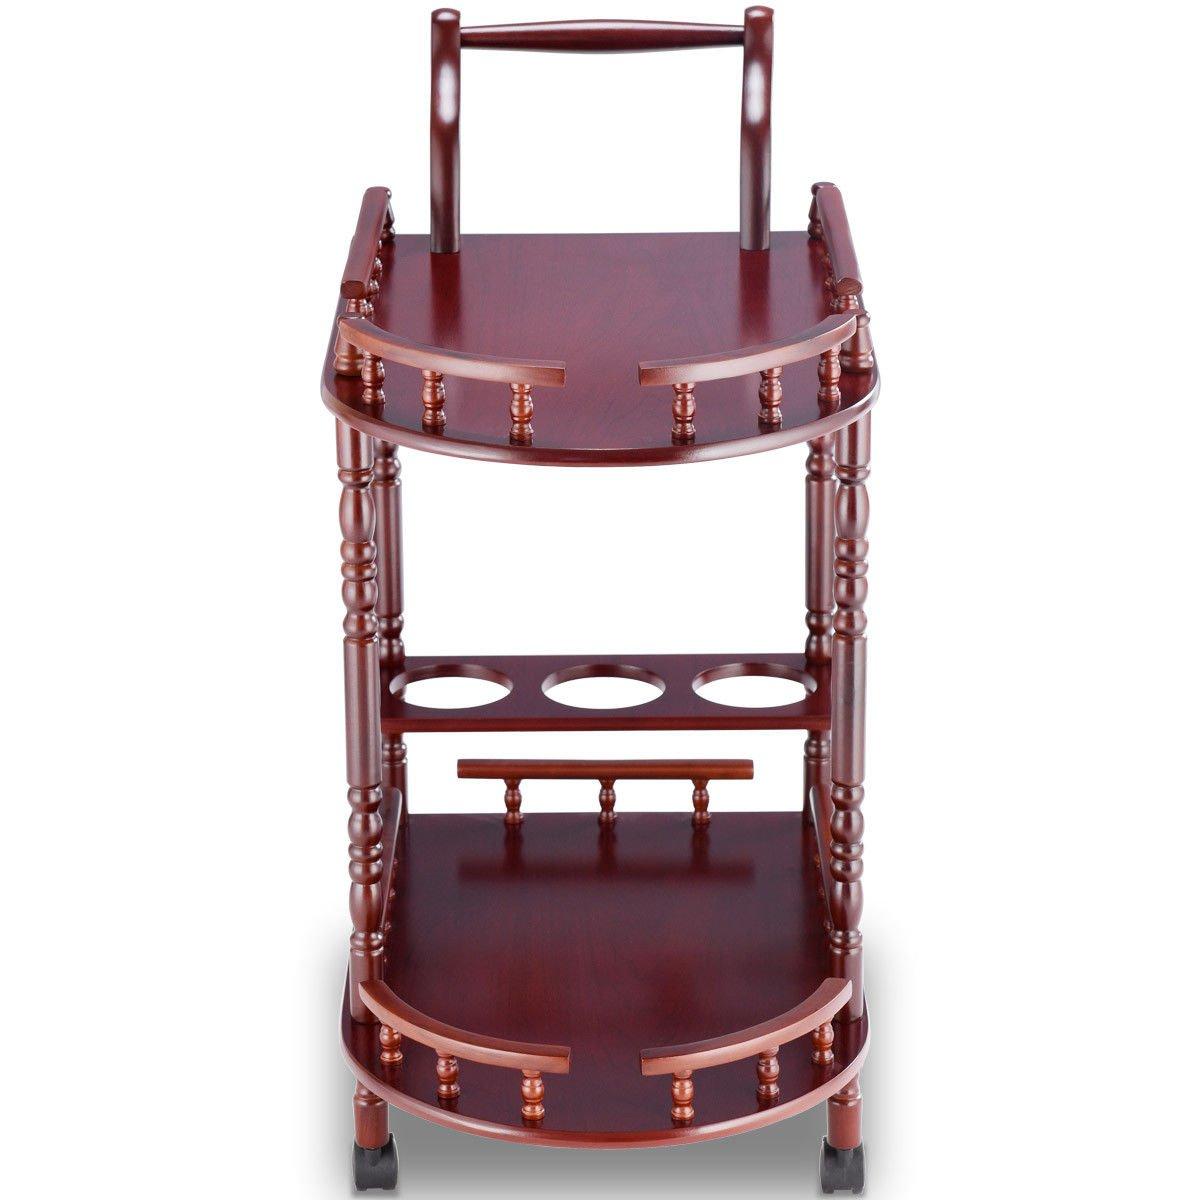 Eosphor US Rolling Serving Trolley Cart Bar Cart Trolley Two-Tier Rack Rolling Wine Rack Hotel Cherry Wood by Eosphor US (Image #3)